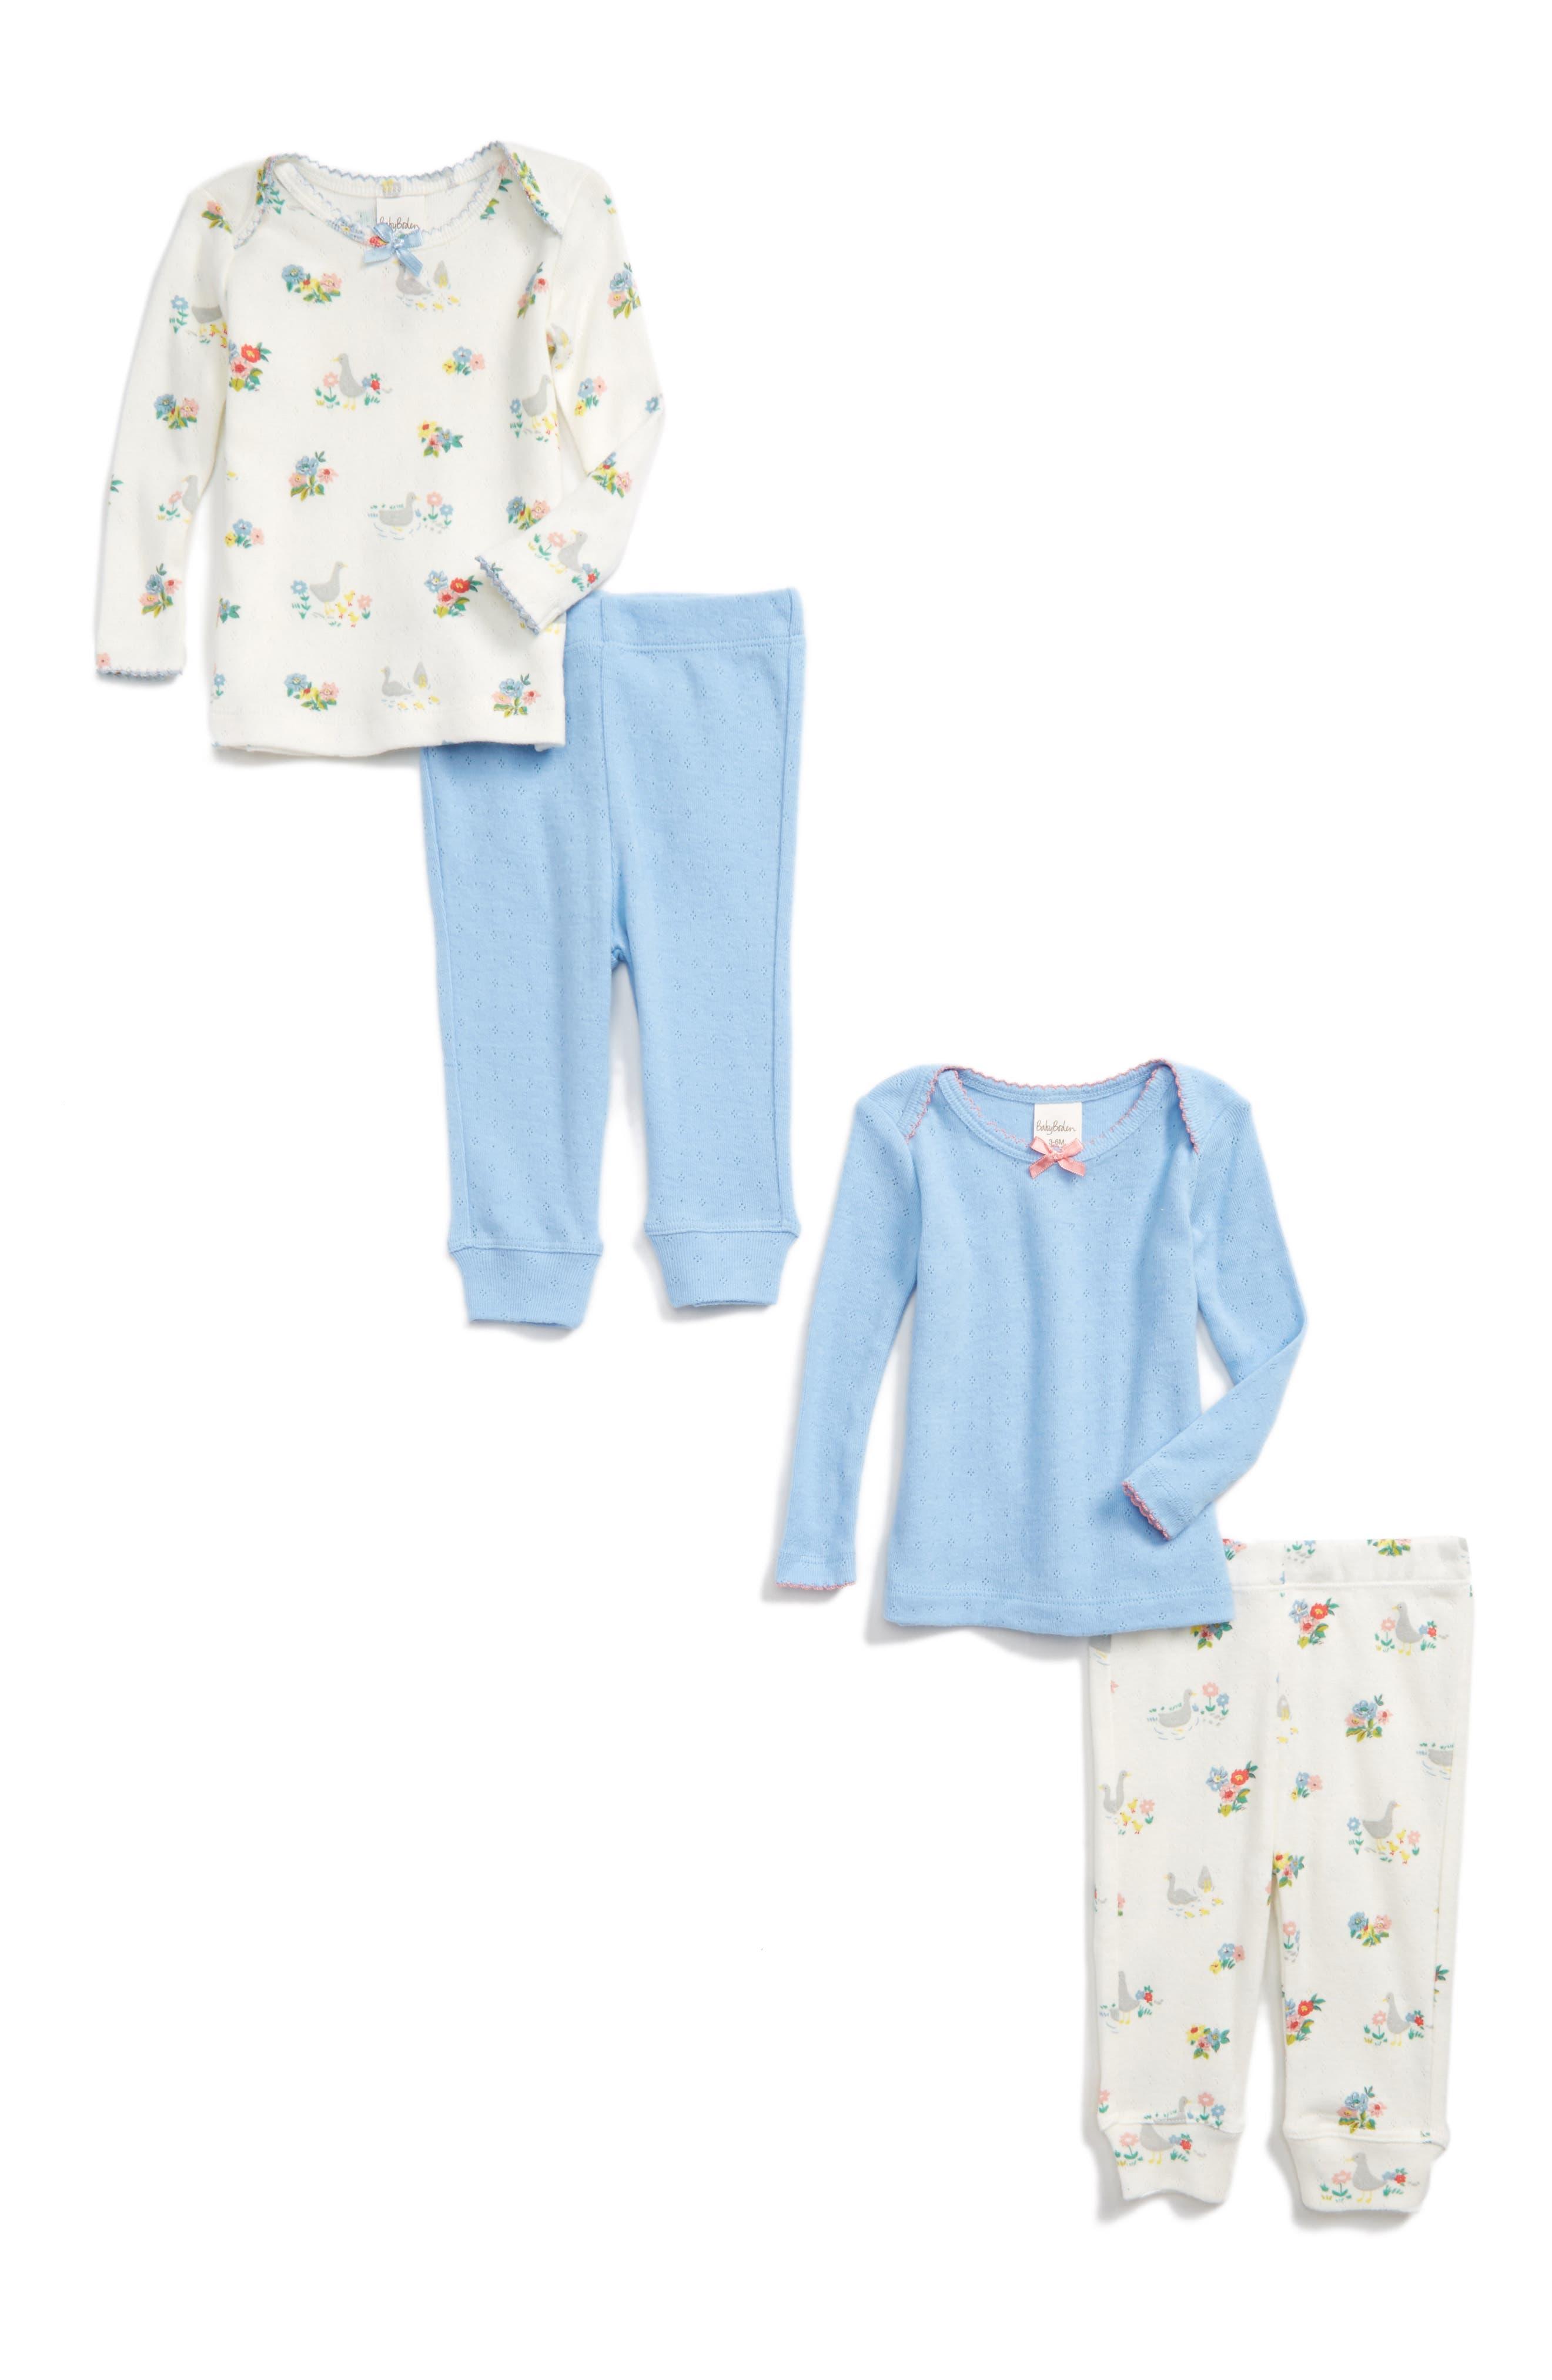 Main Image - Mini Boden Cozy Pointelle 2-Pack Tee & Pants Set (Baby Girls & Toddler Girls)